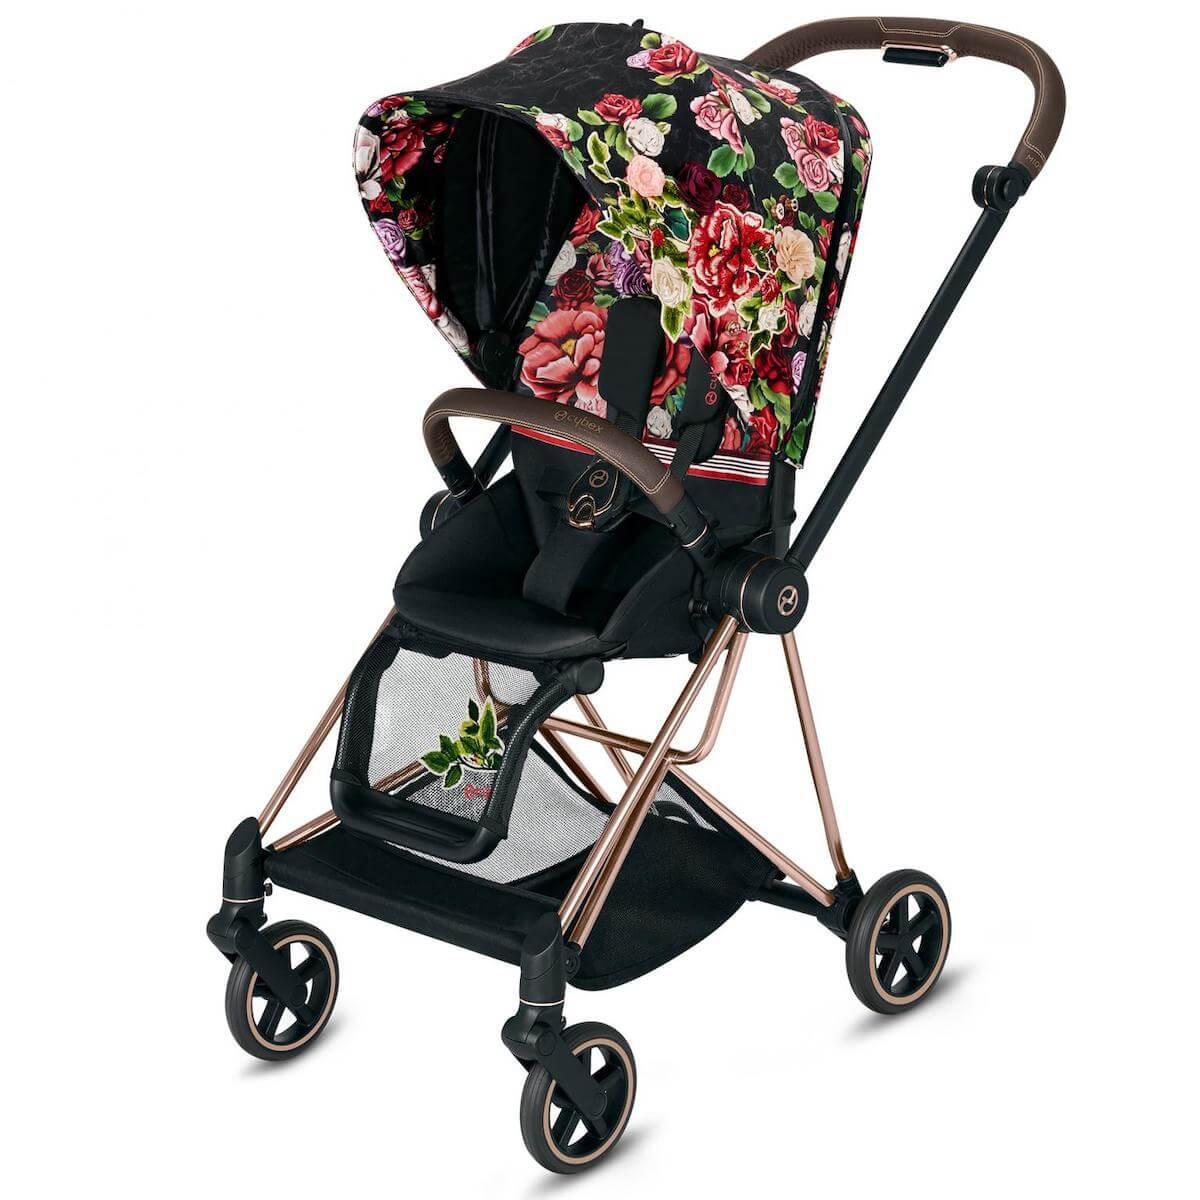 Asiento-pack silla MIOS Cybex spring blossom dark-black